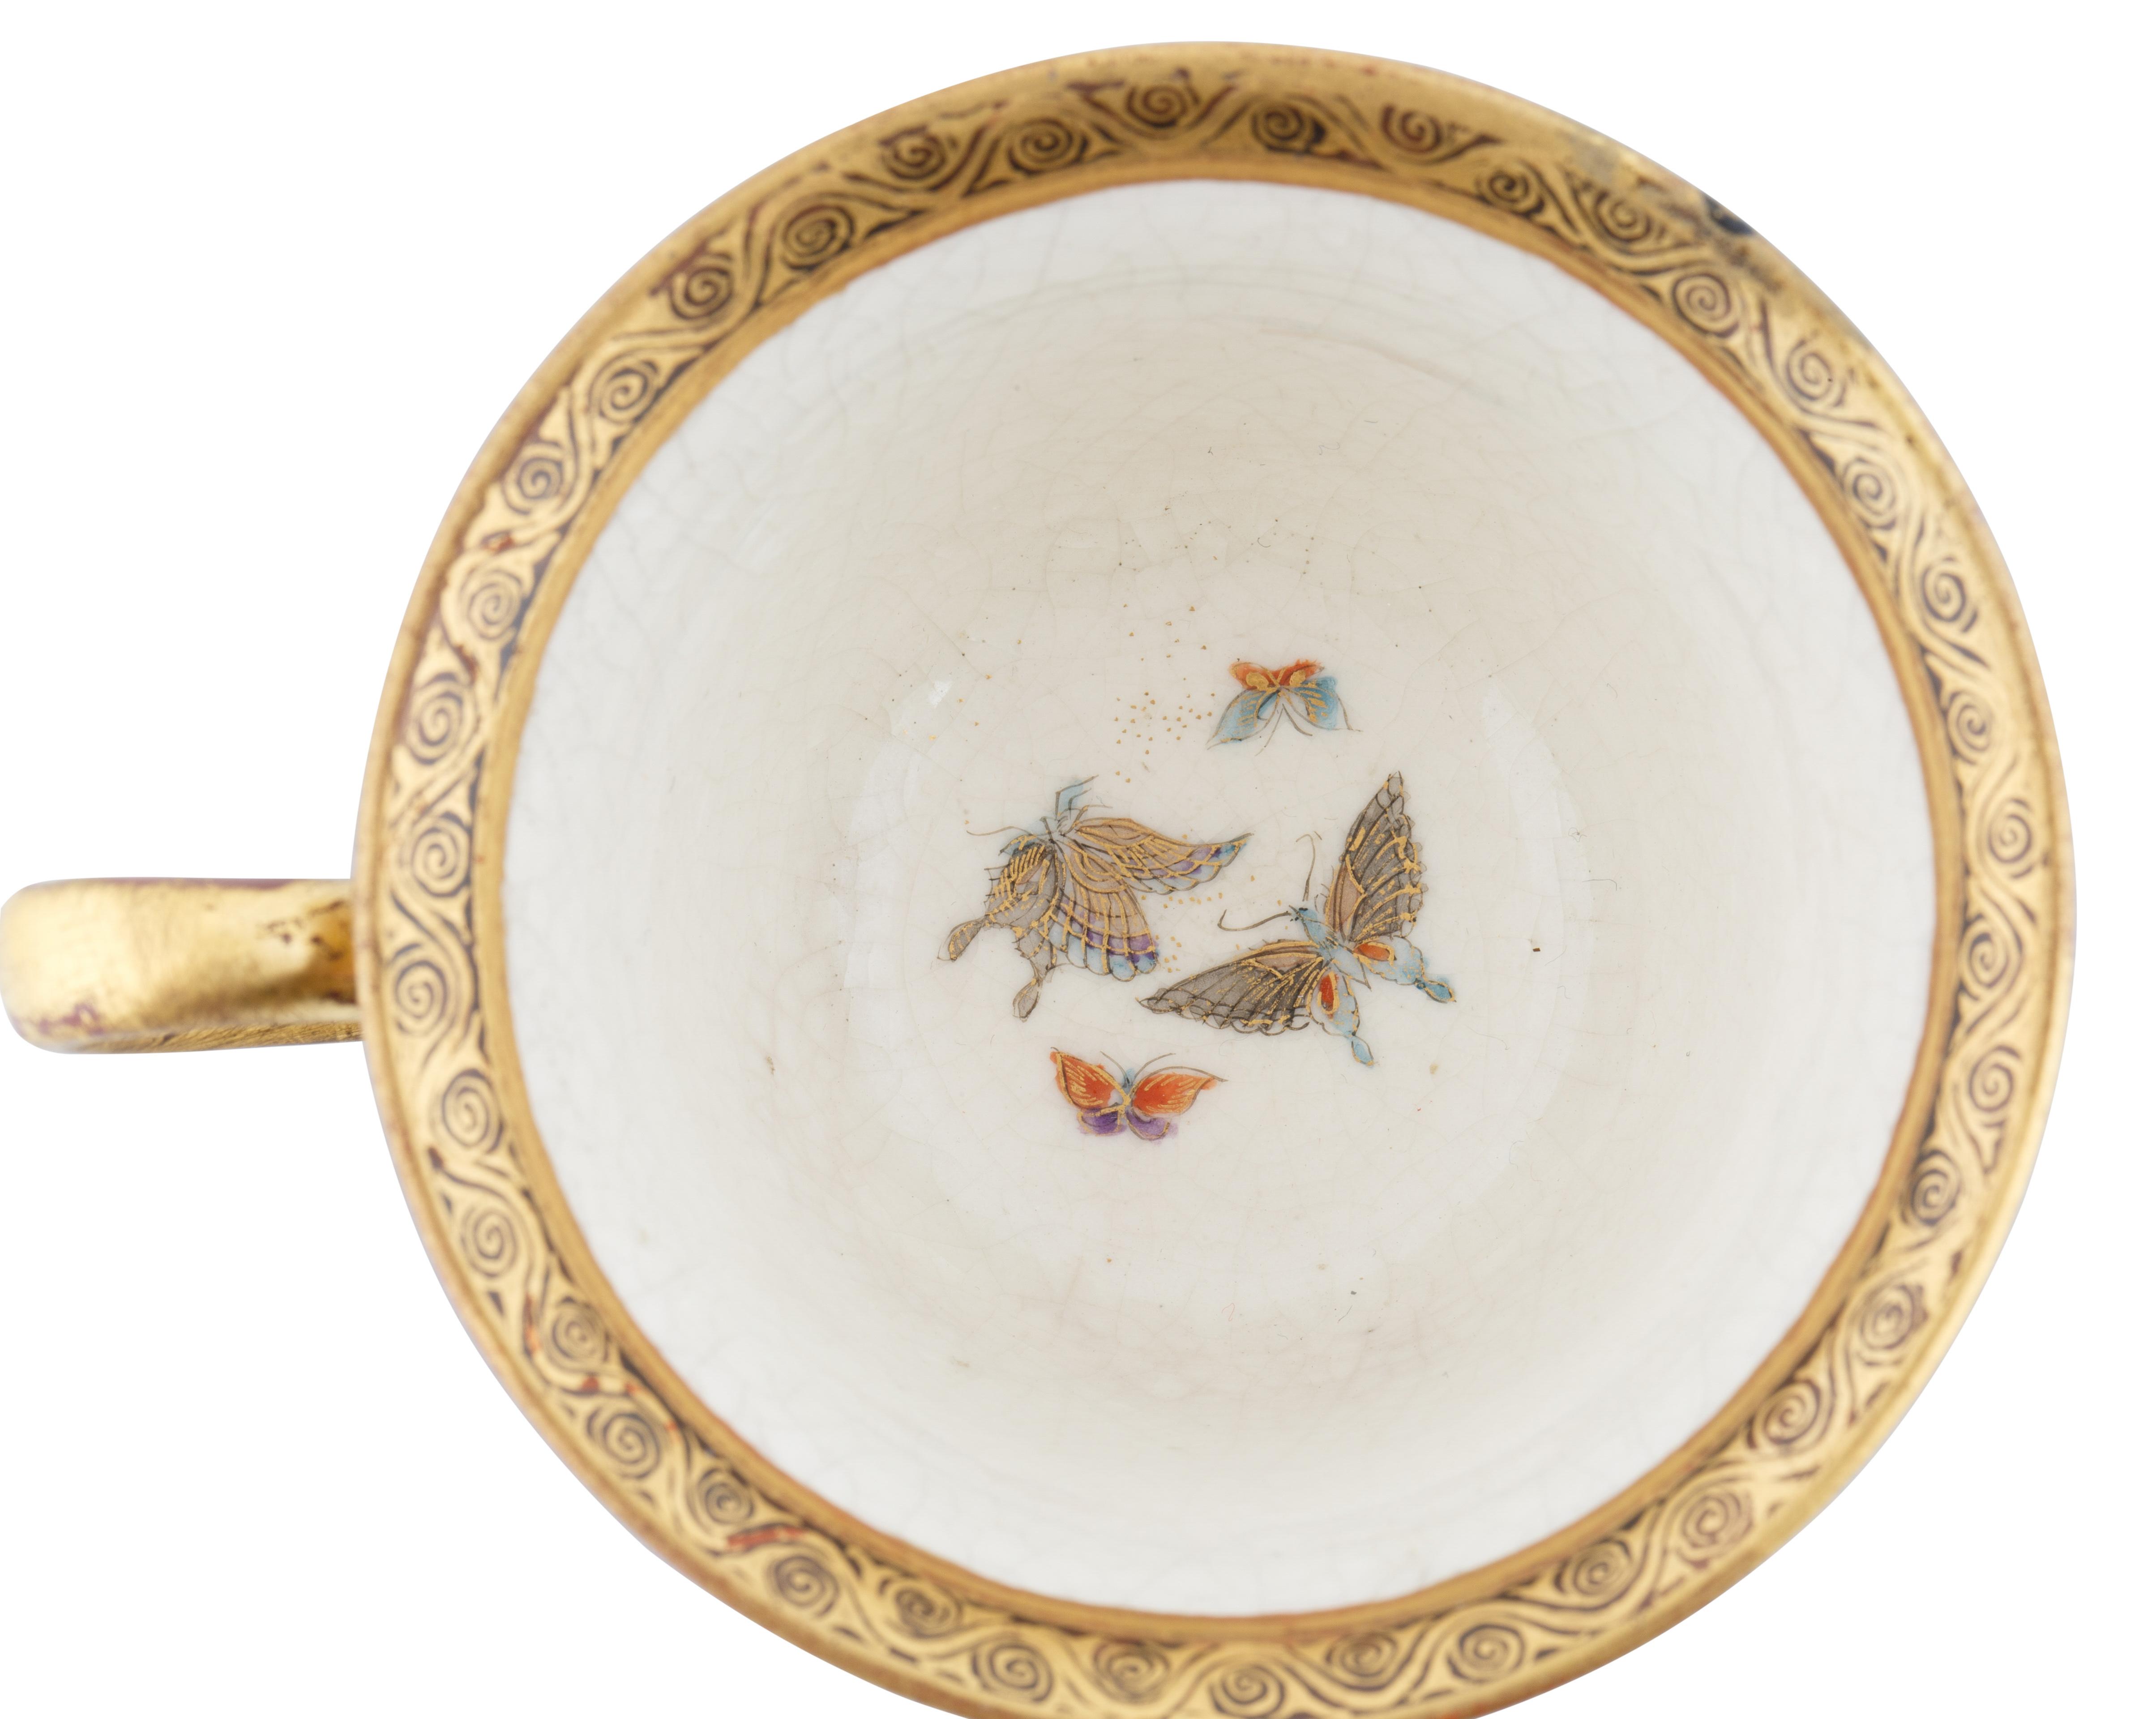 19TH CENTURY SATSUMA PORCELAIN TEA CUP AND SAUCER - Image 3 of 7